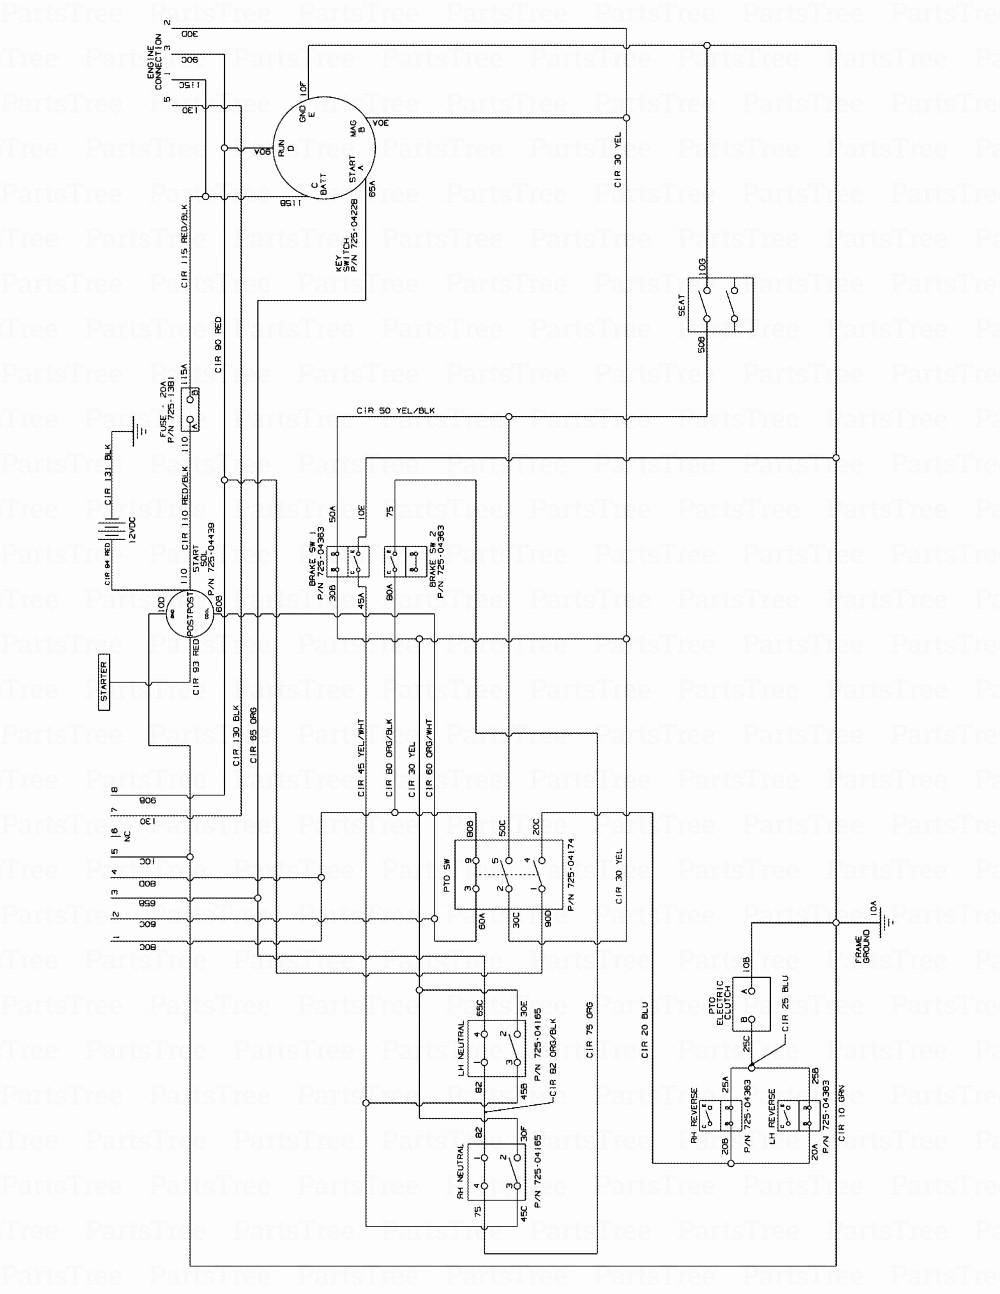 hight resolution of cub cadet w600 wiring diagram wiring library cub cadet w600 wiring diagram